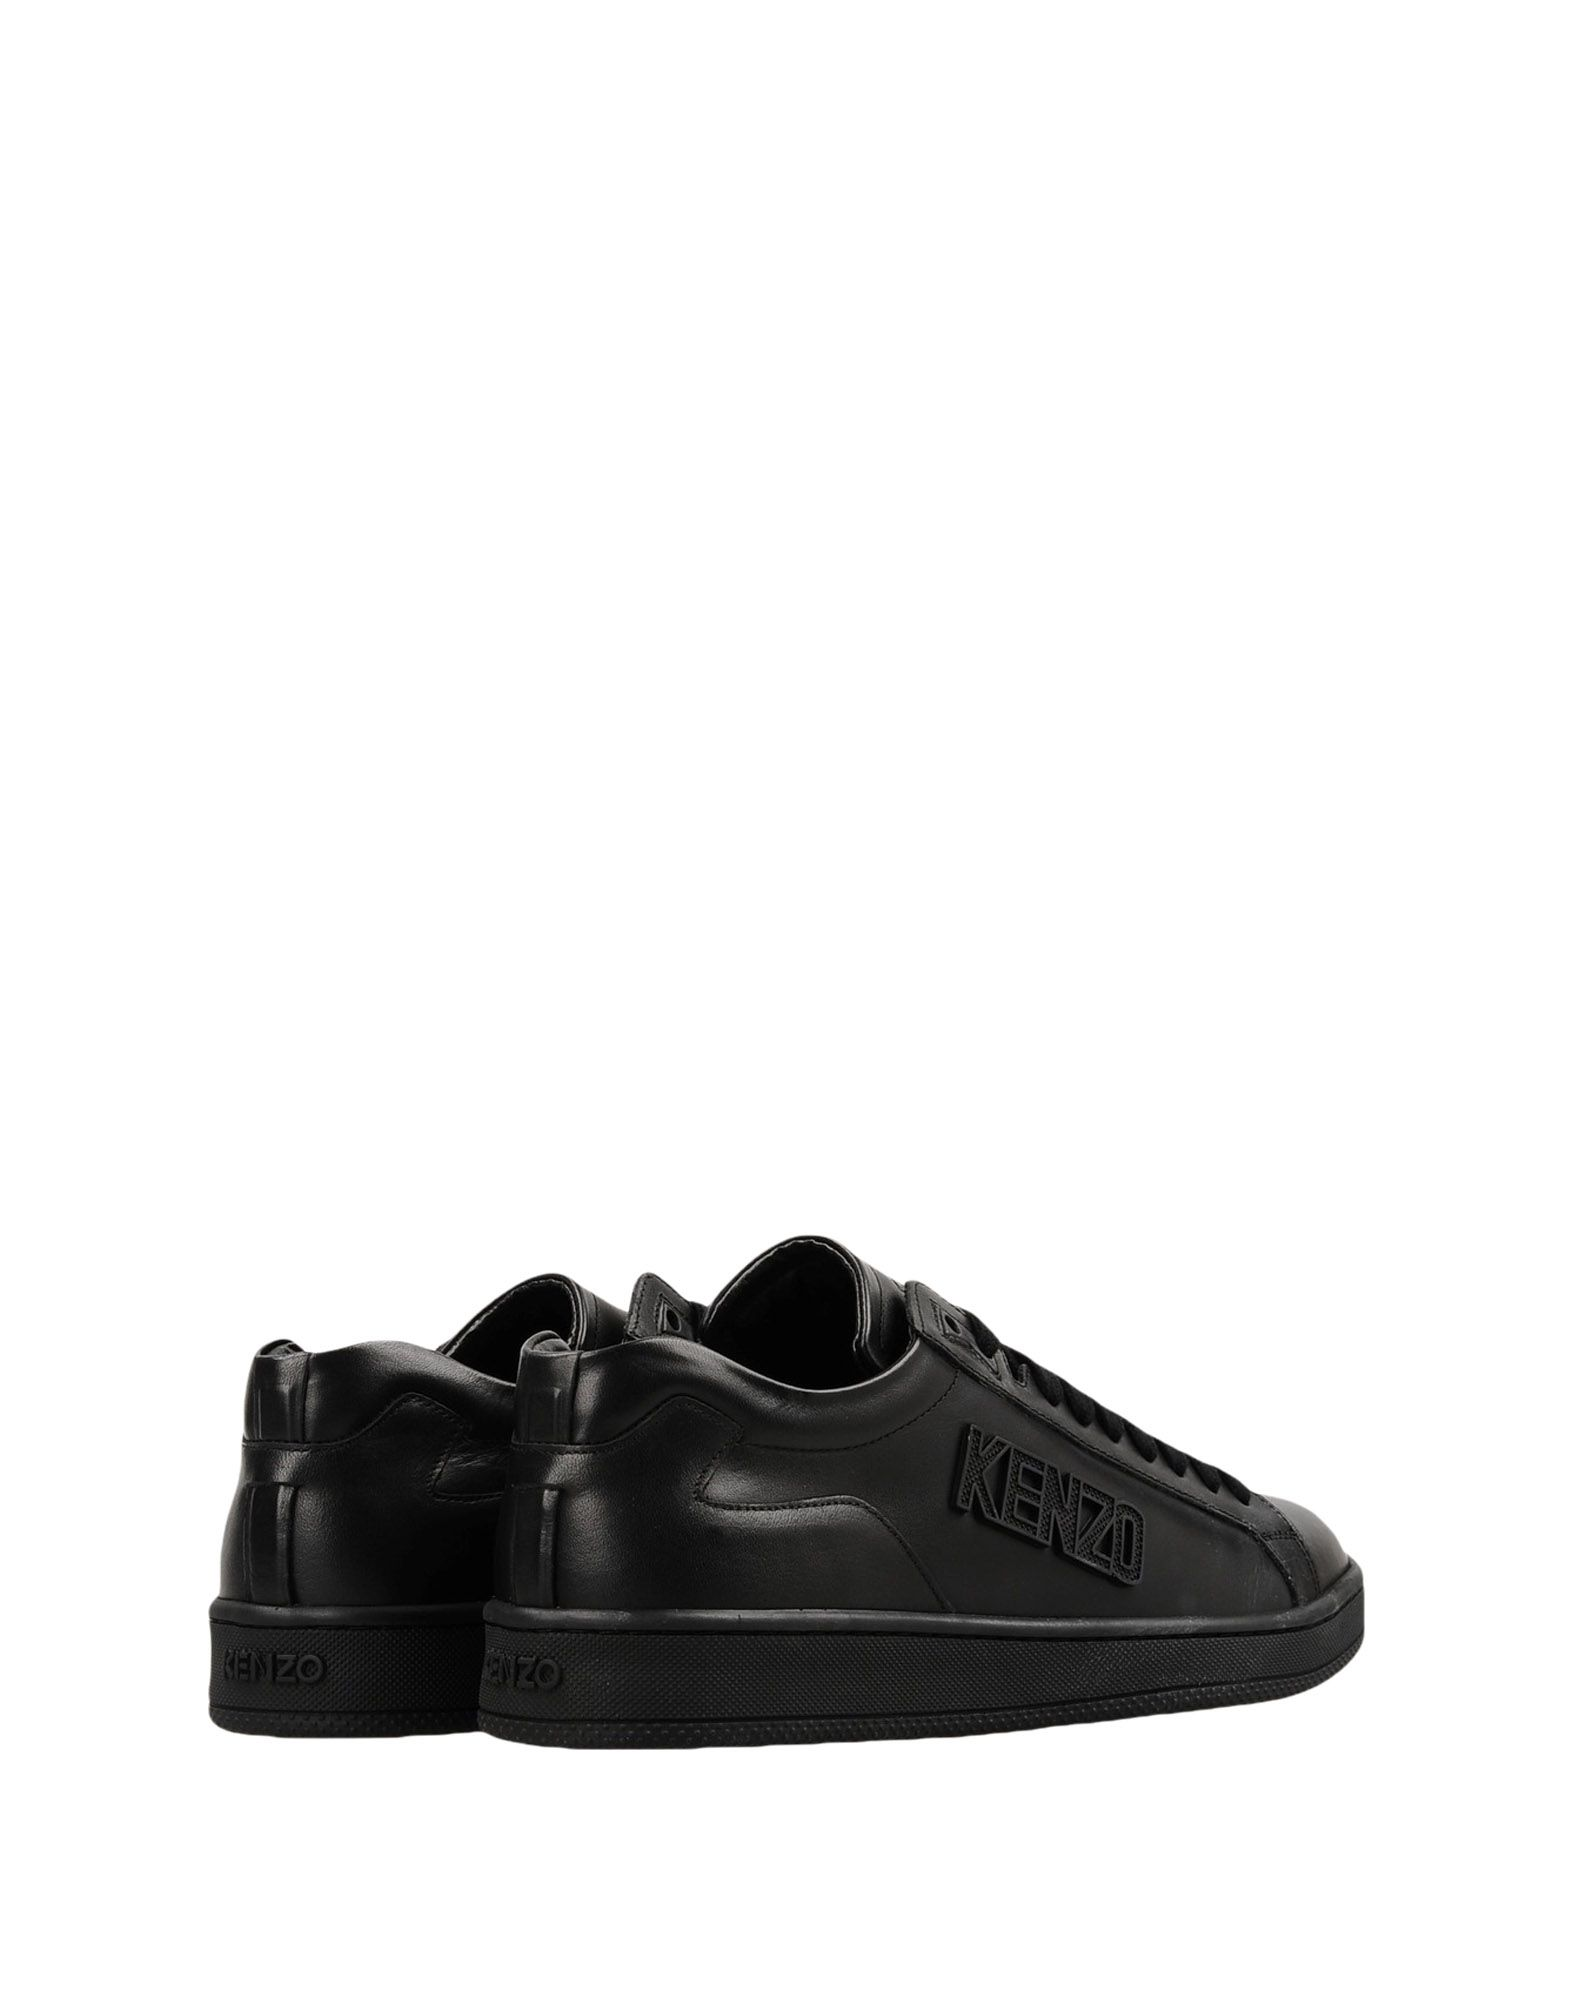 Kenzo Tennix Basket Colorblock  11430983XD Gute Gute Gute Qualität beliebte Schuhe 393240